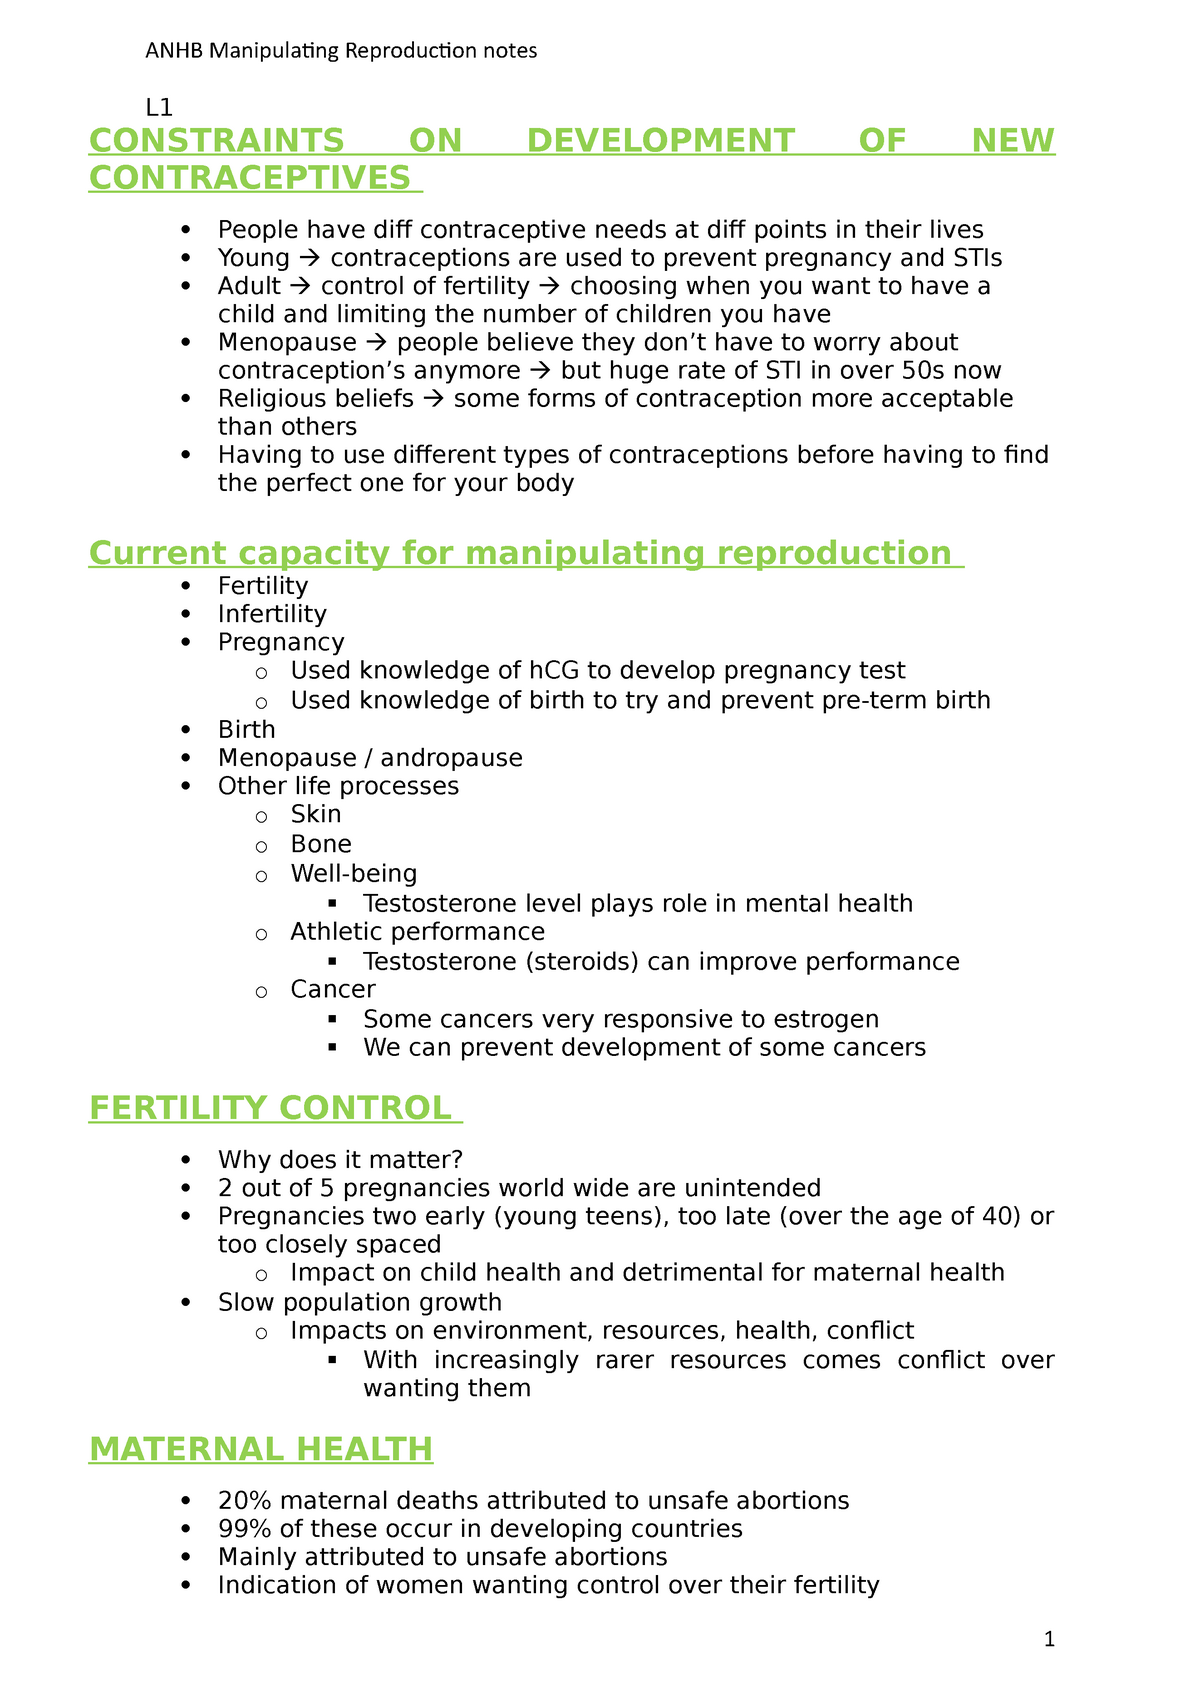 Manipulating Reproduction notes - ANHB1101 : Human Biology I